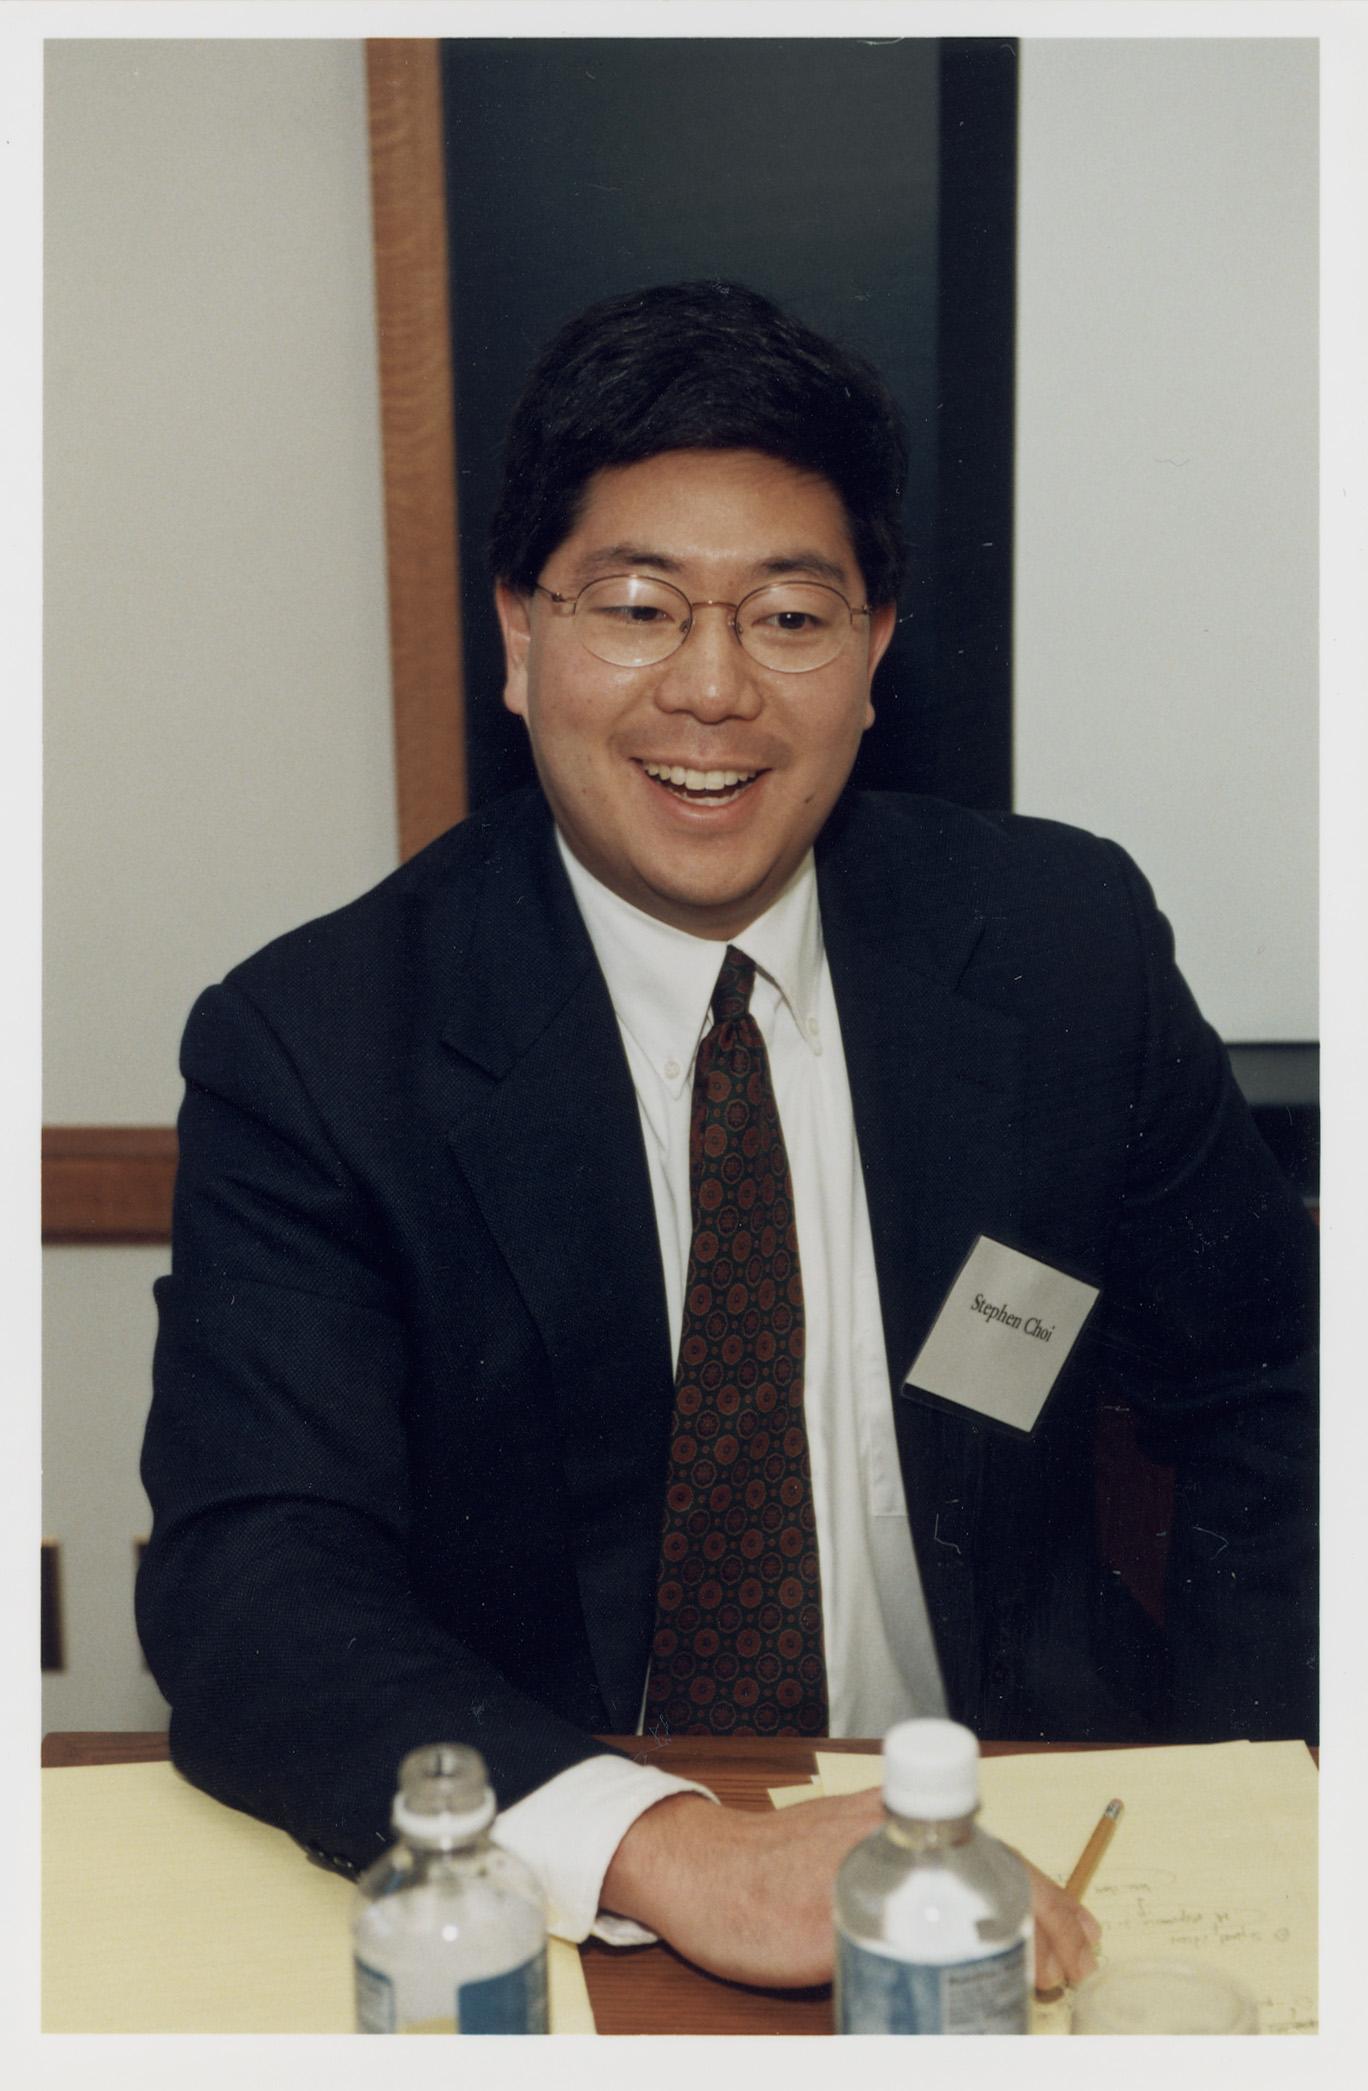 Berkeley Law Prof. Stephen Choi